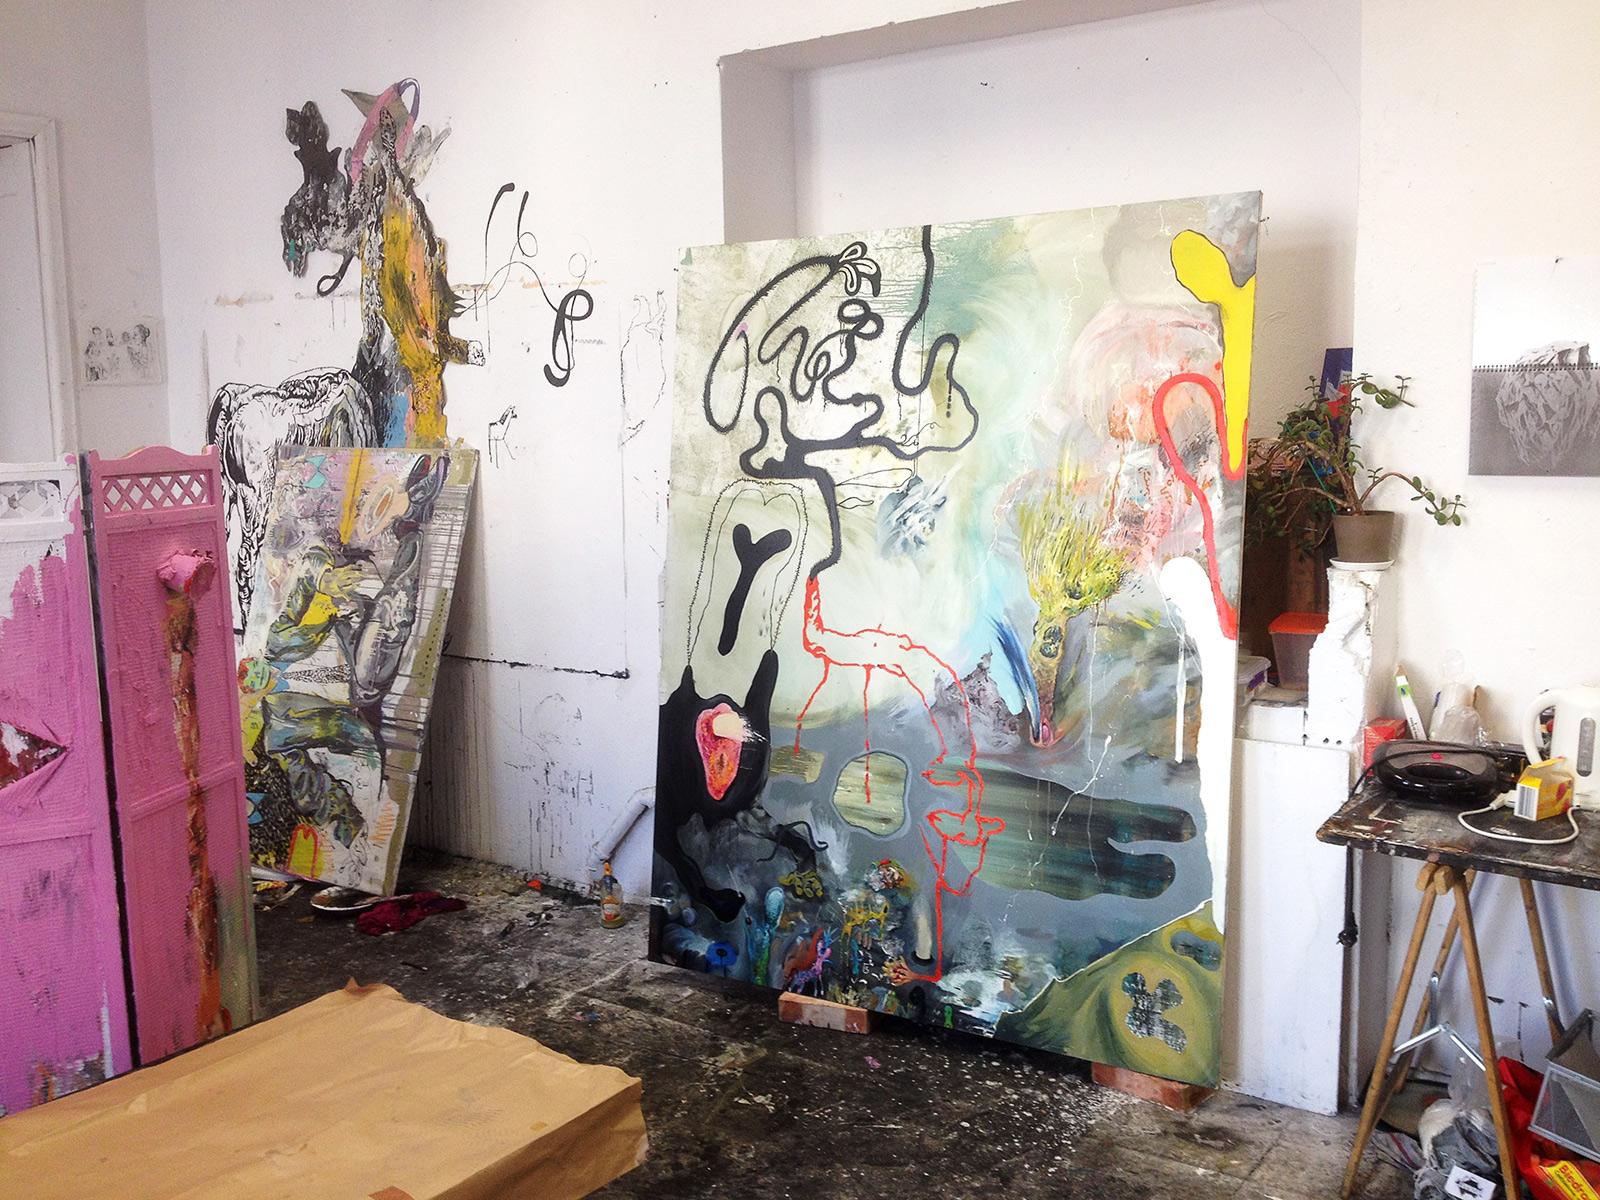 View in the artist's studio